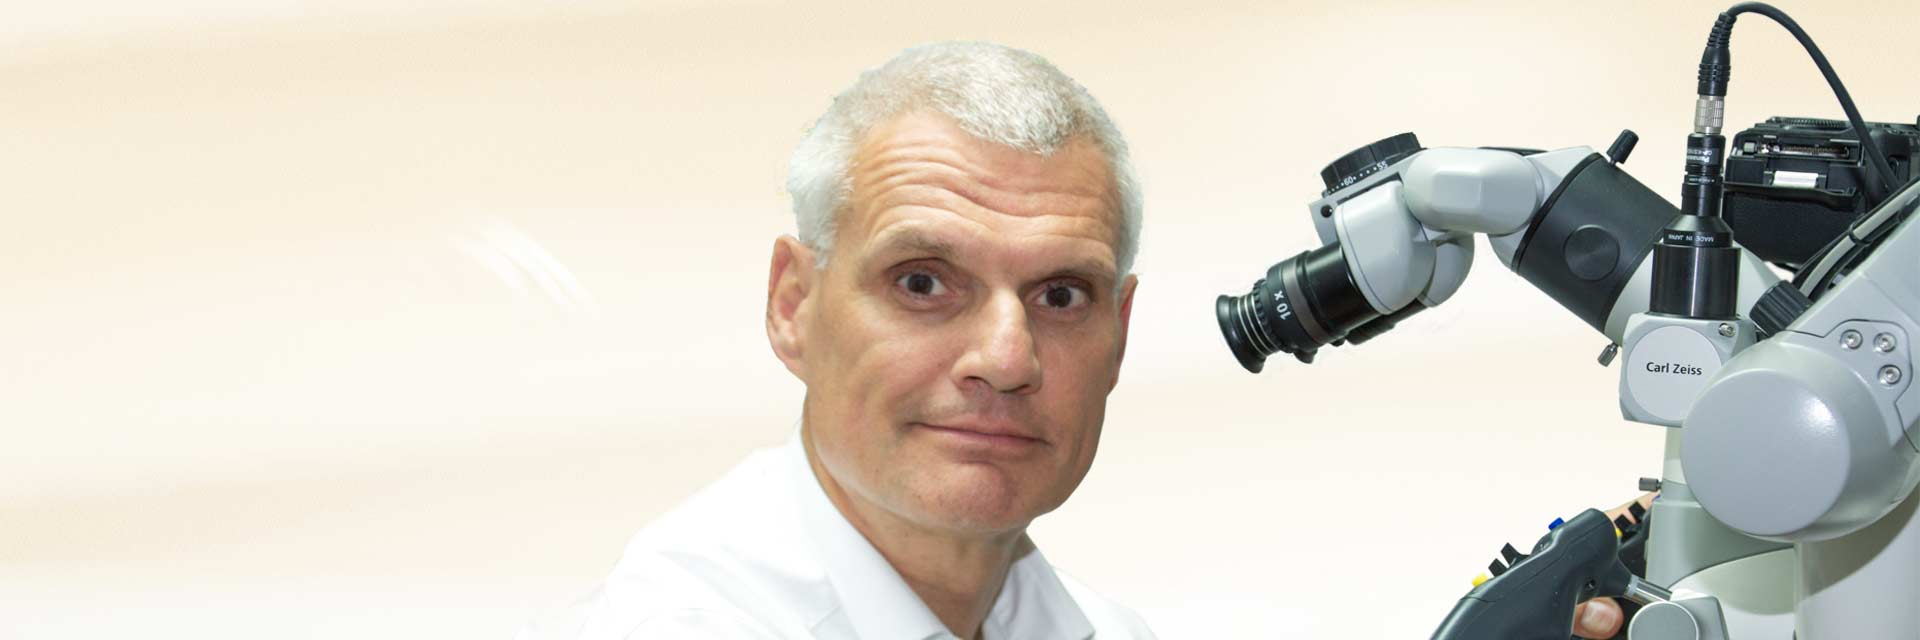 Endodontie Münster Dr. Thorsten Neuber